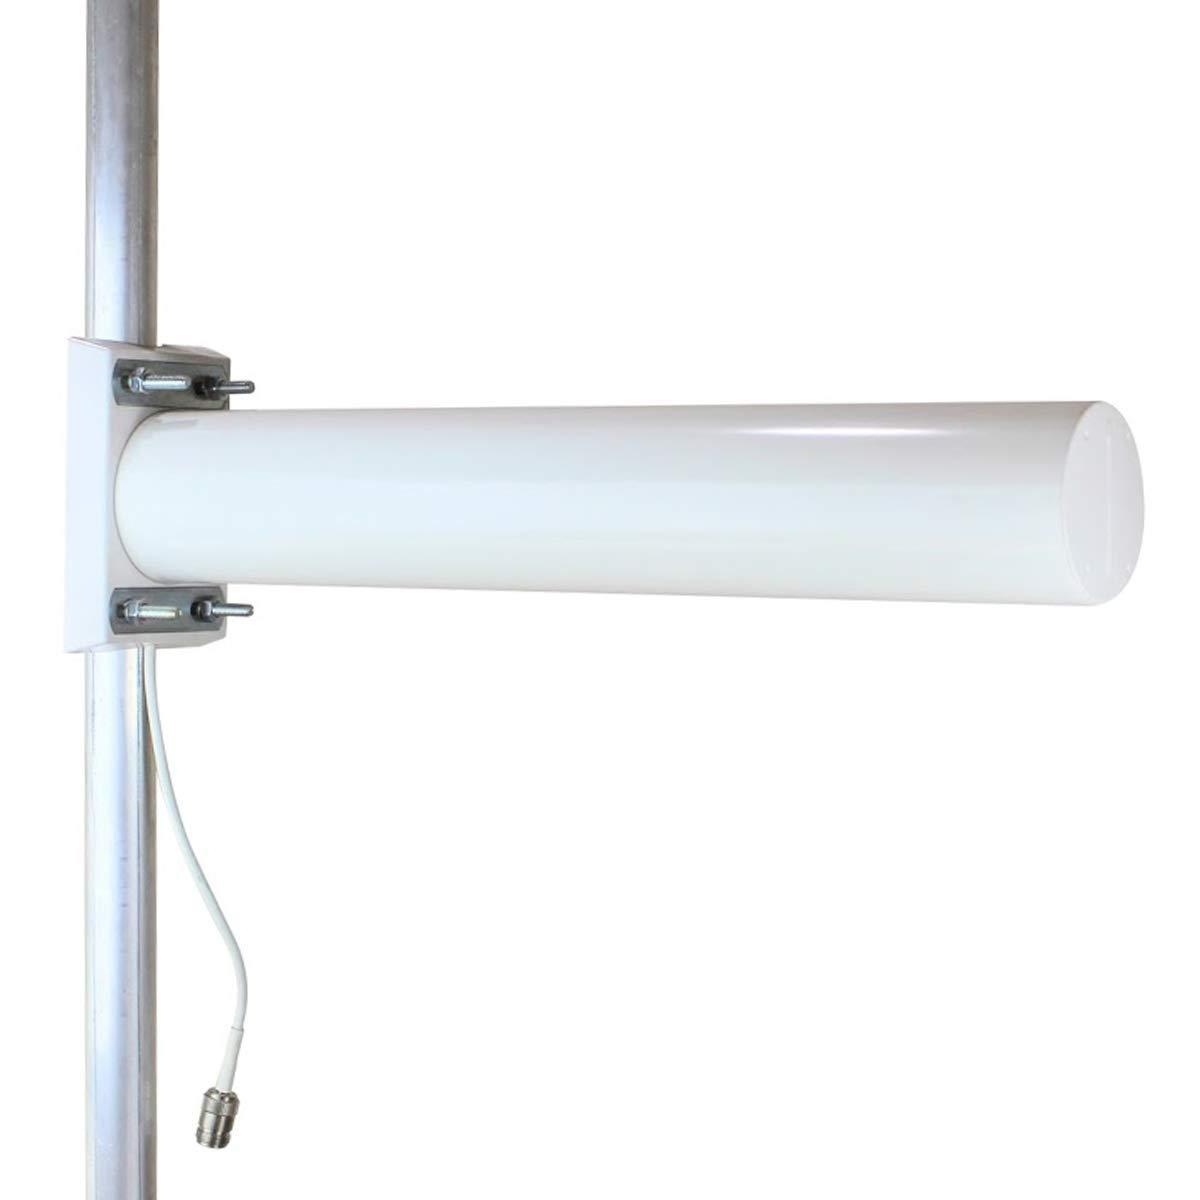 Cheap Build Long Range Wifi Antenna, find Build Long Range